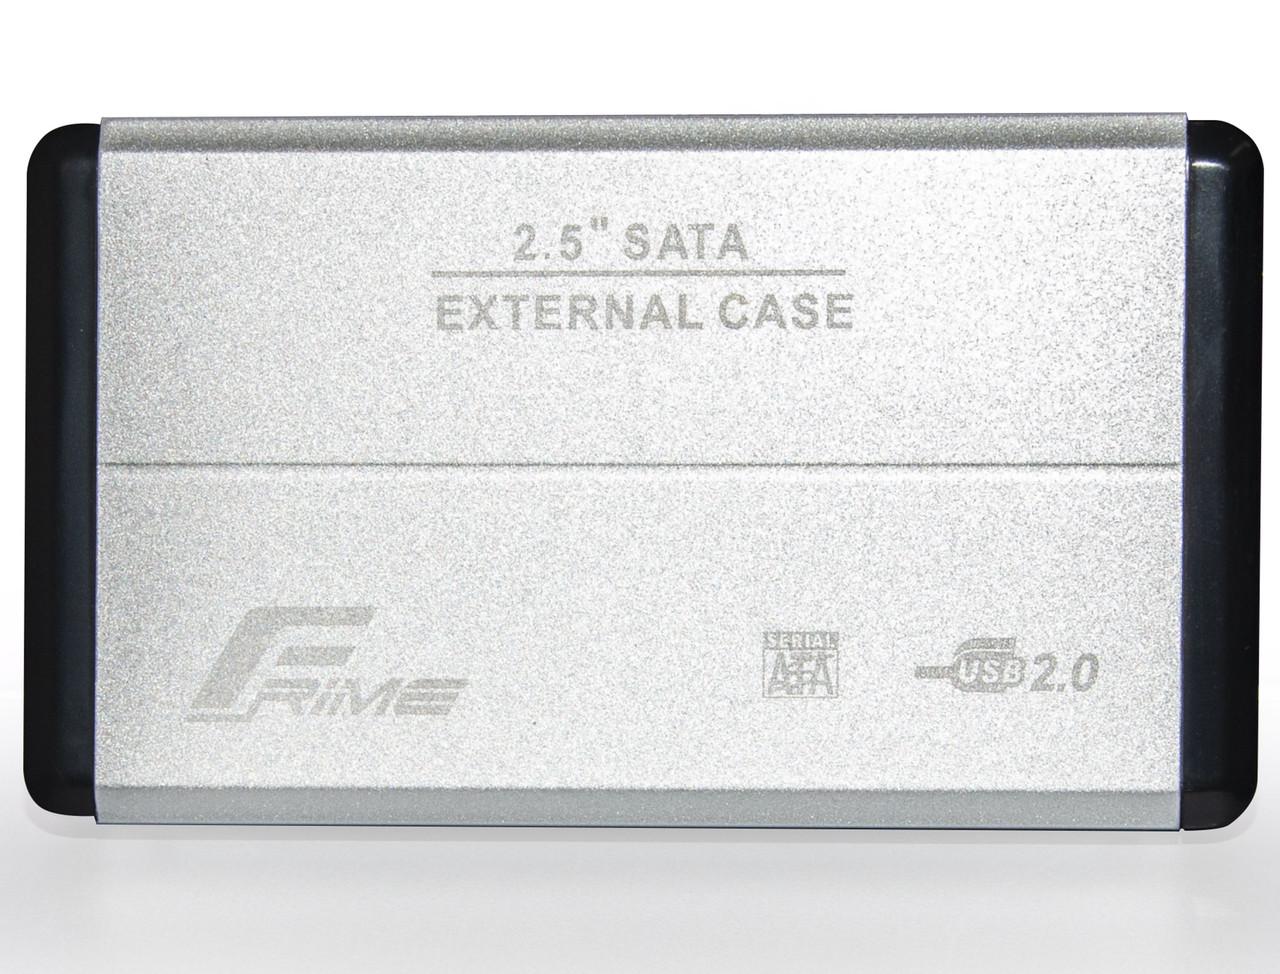 "Внешний карман Frime SATA HDD/SSD 2.5"", USB 2.0, Metal, Silver (FHE21.25U20)"